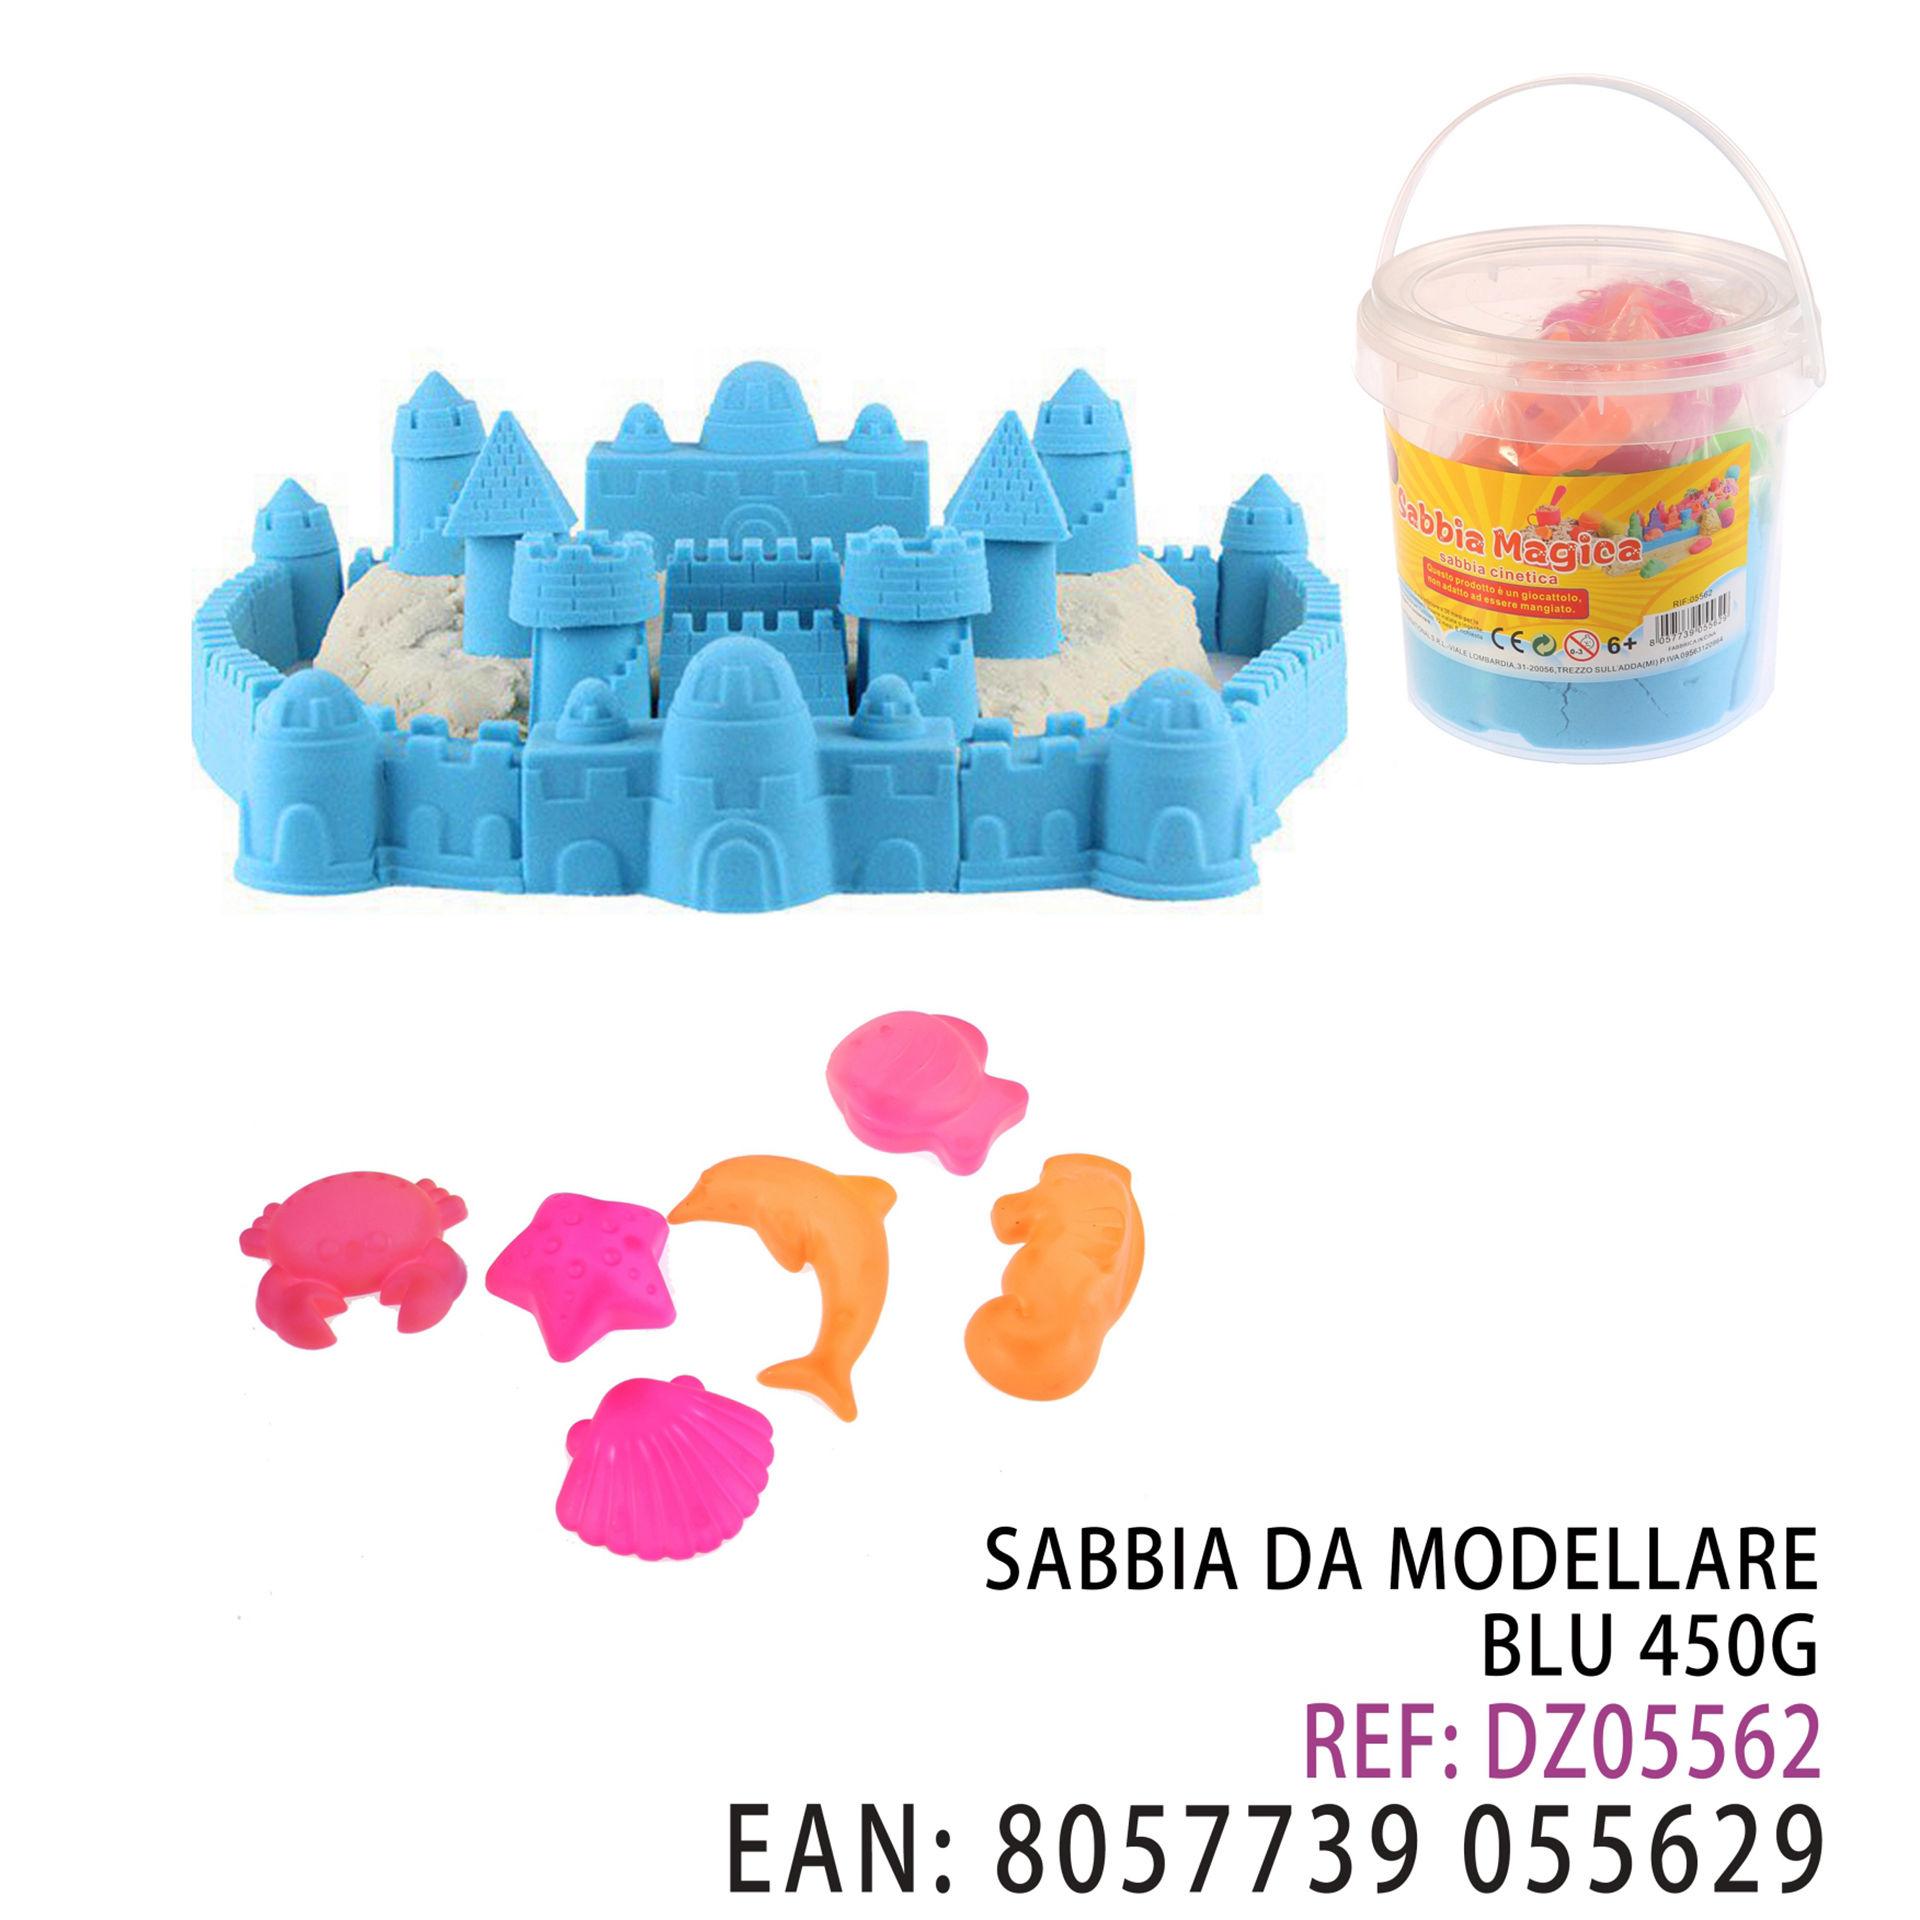 SABBIA DA MODELLARE BLU 450GDz